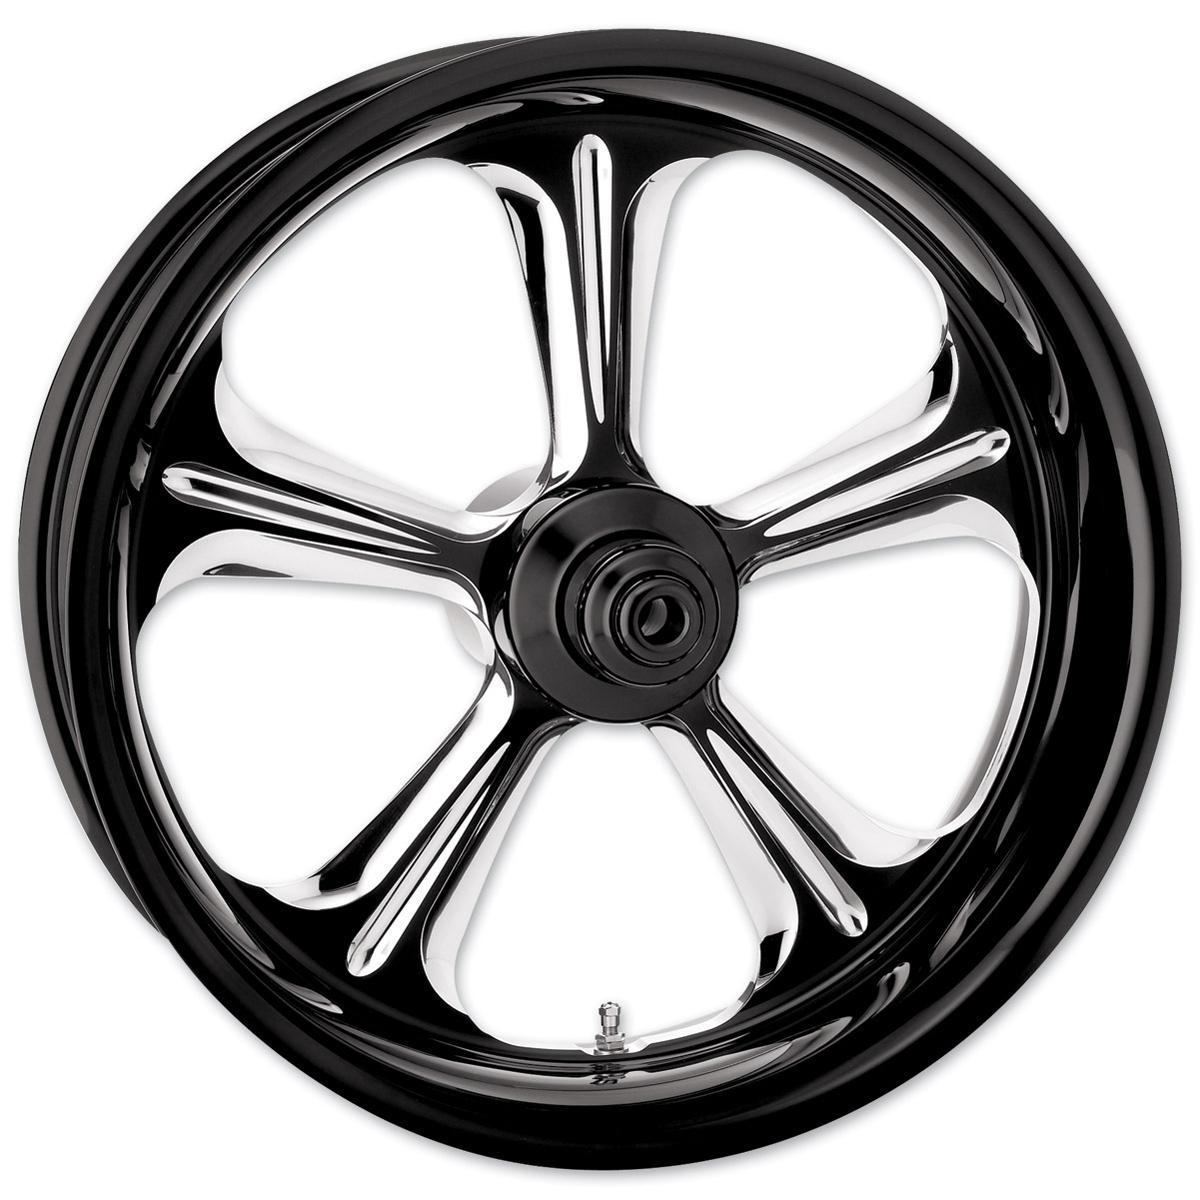 Performance Machine Wrath Platinum Cut Front Wheel 21x2.15 ABS